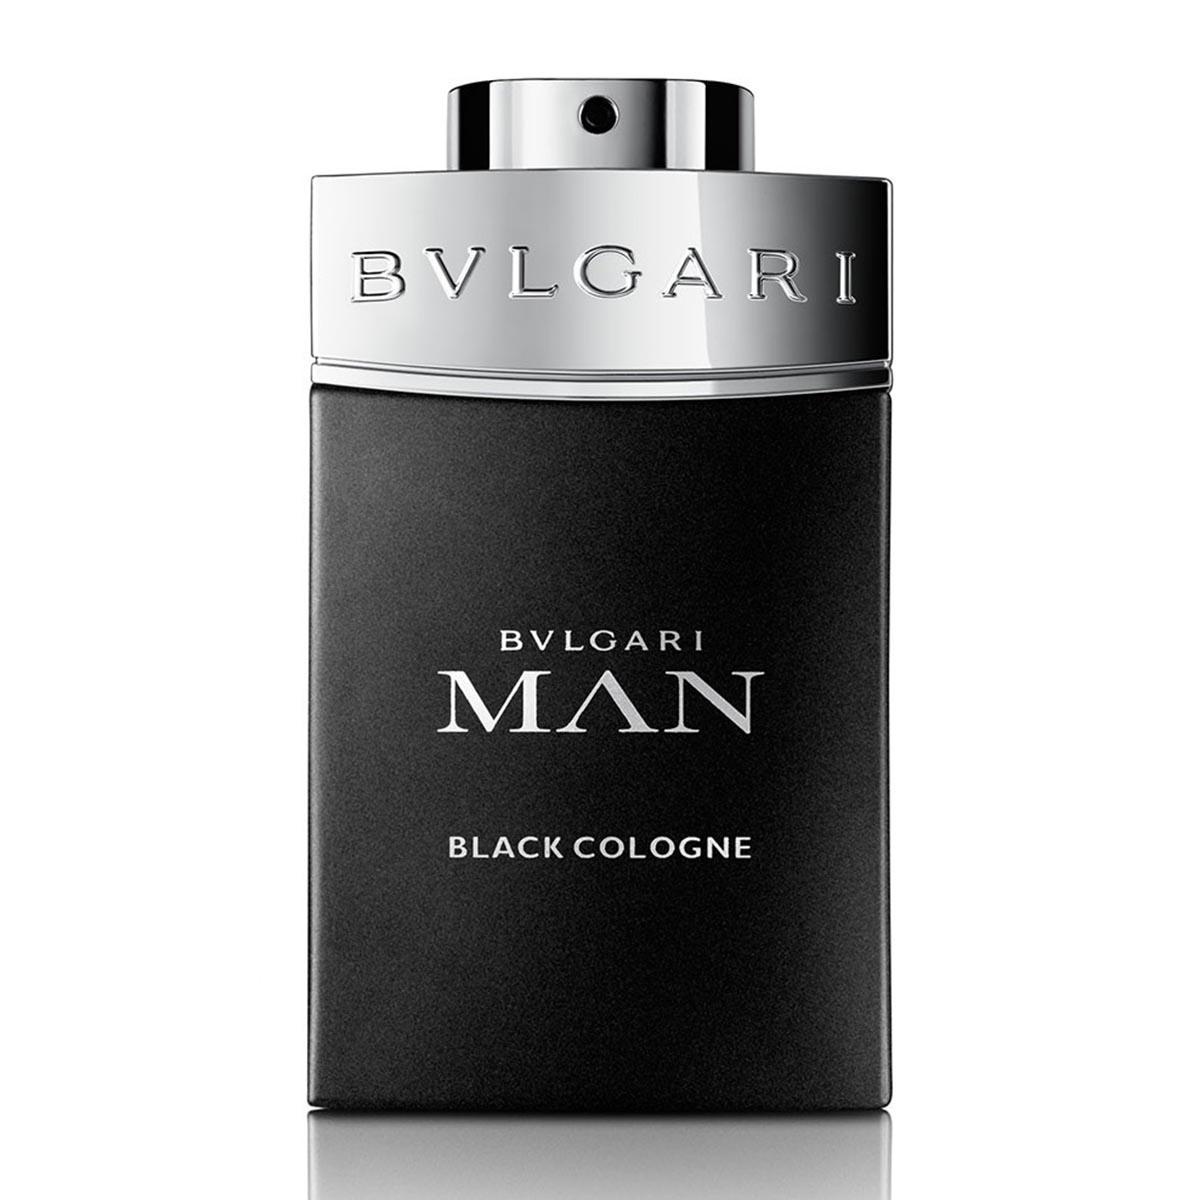 Bvlgari man black cologne eau de toilette 60ml vaporizador